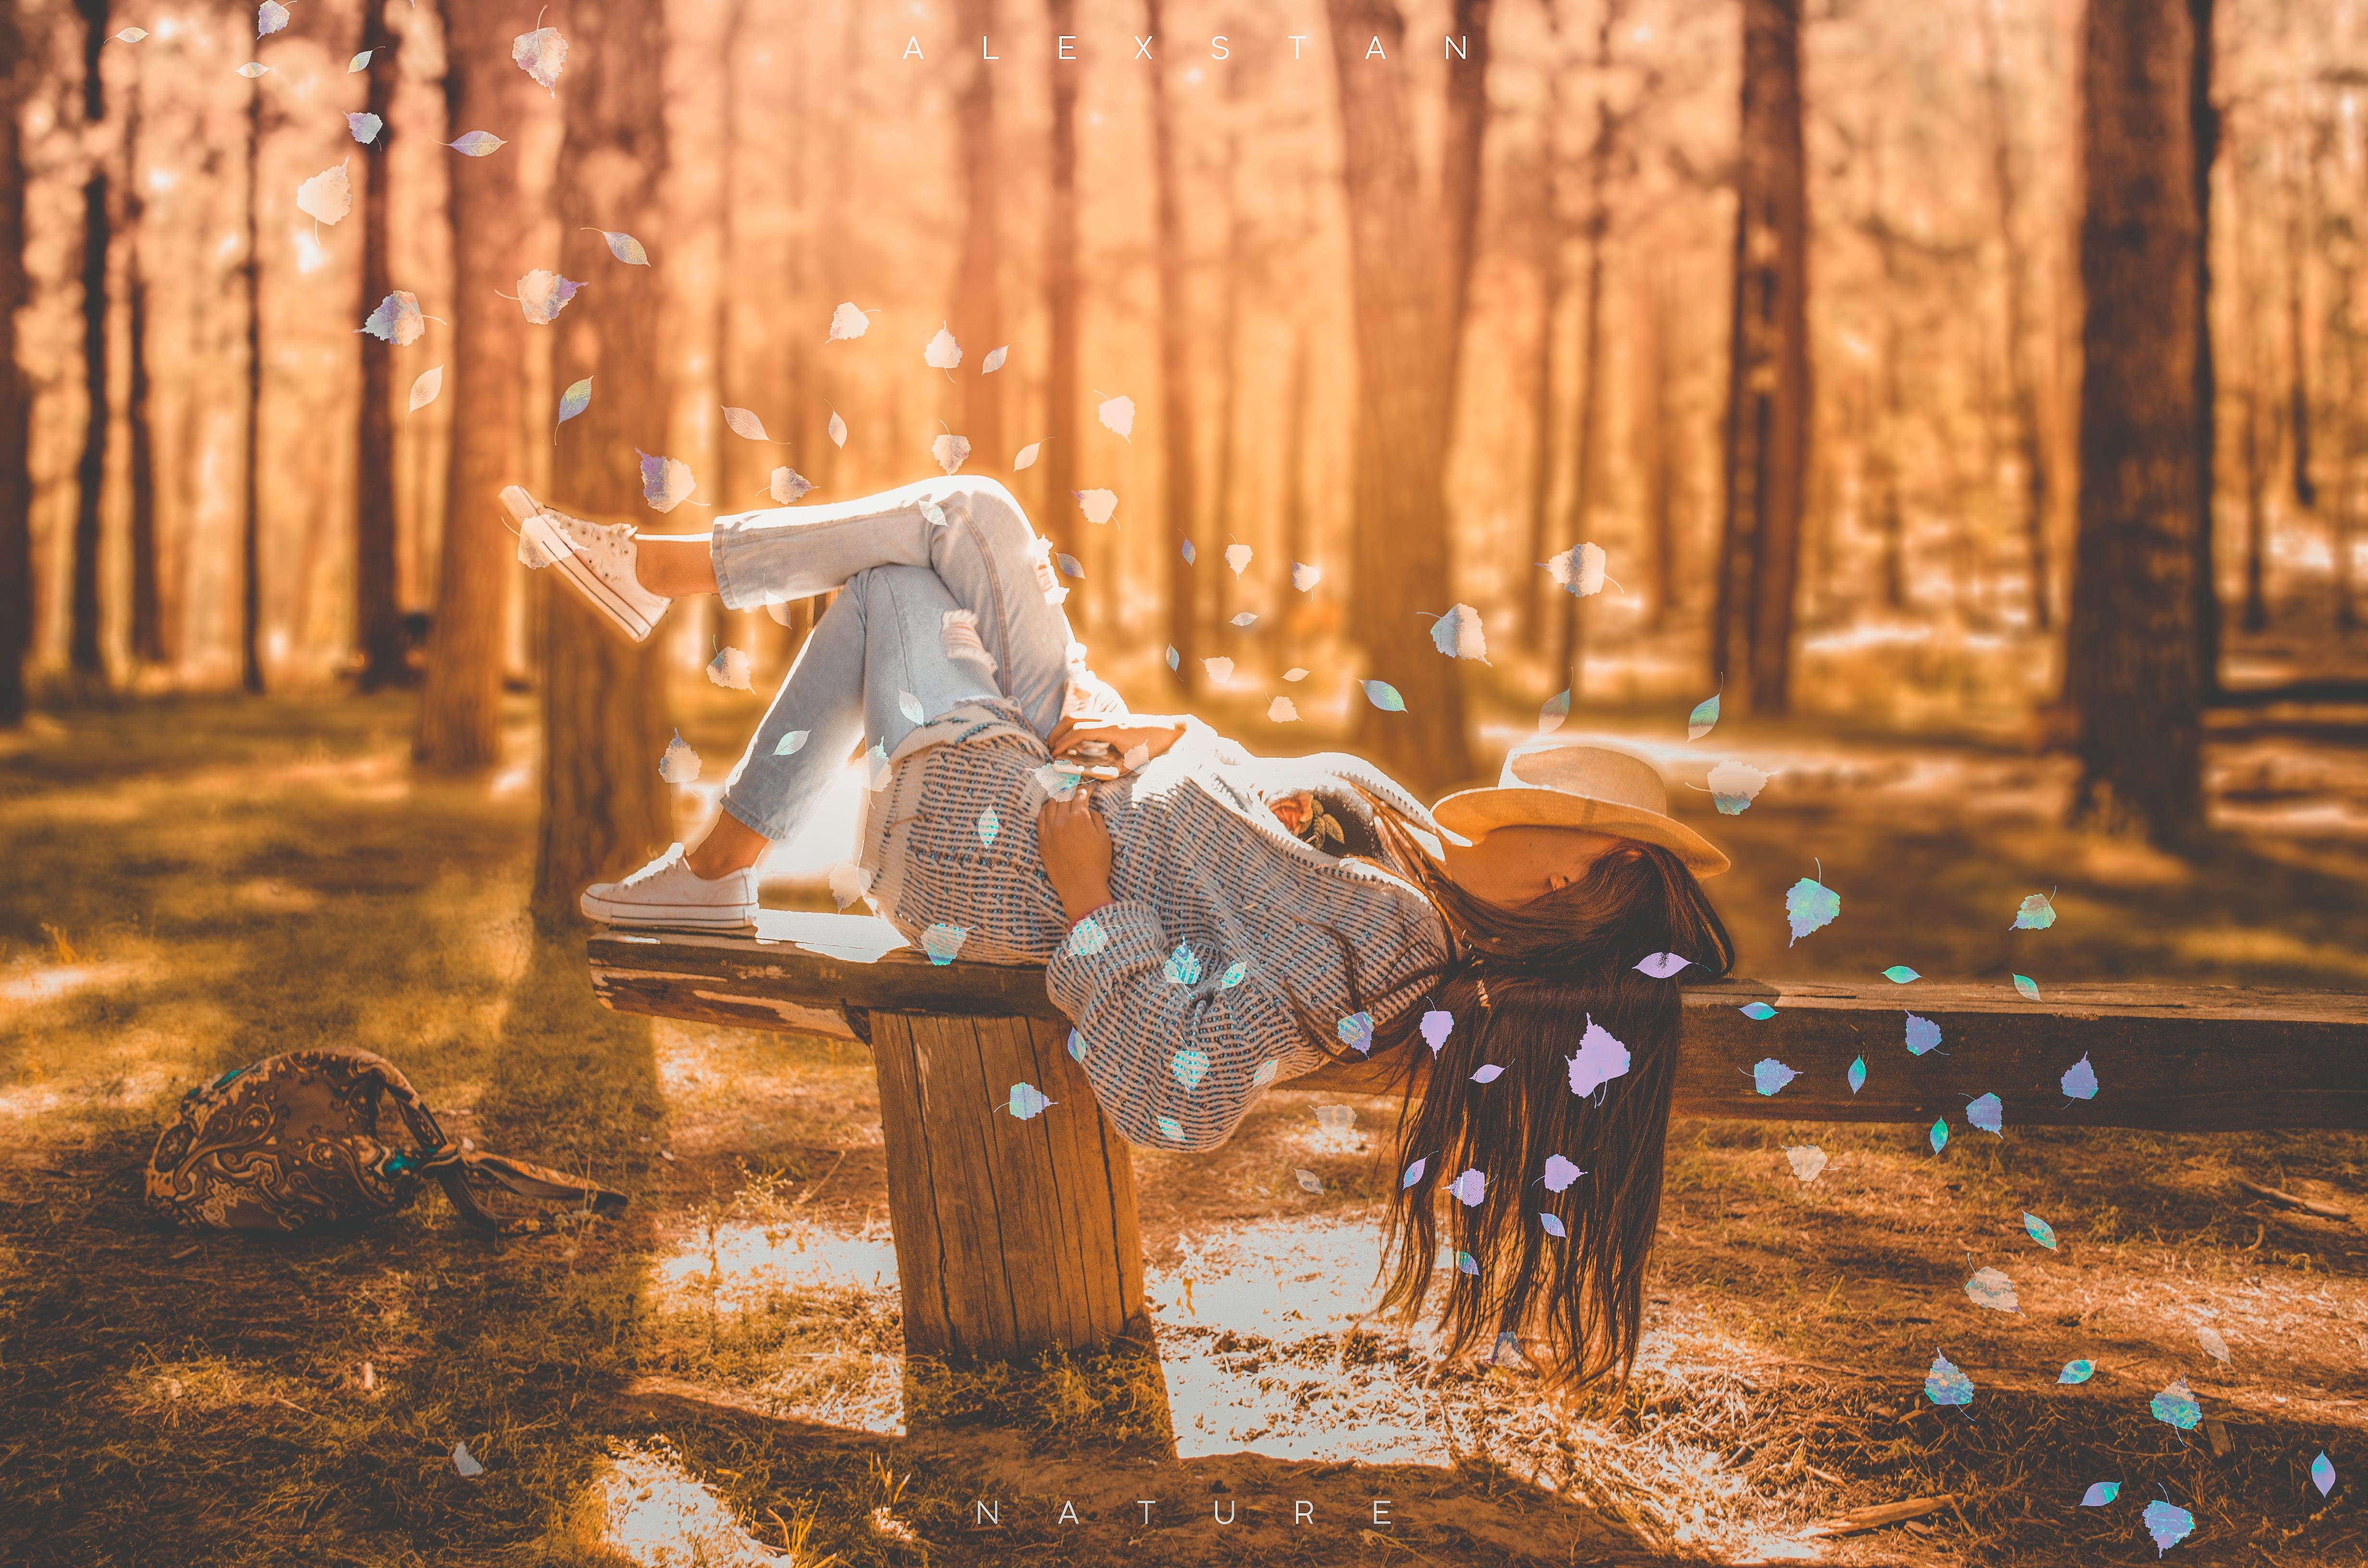 Free stock photo of Adobe Photoshop, arte abstracto, CIUDAD, dulce